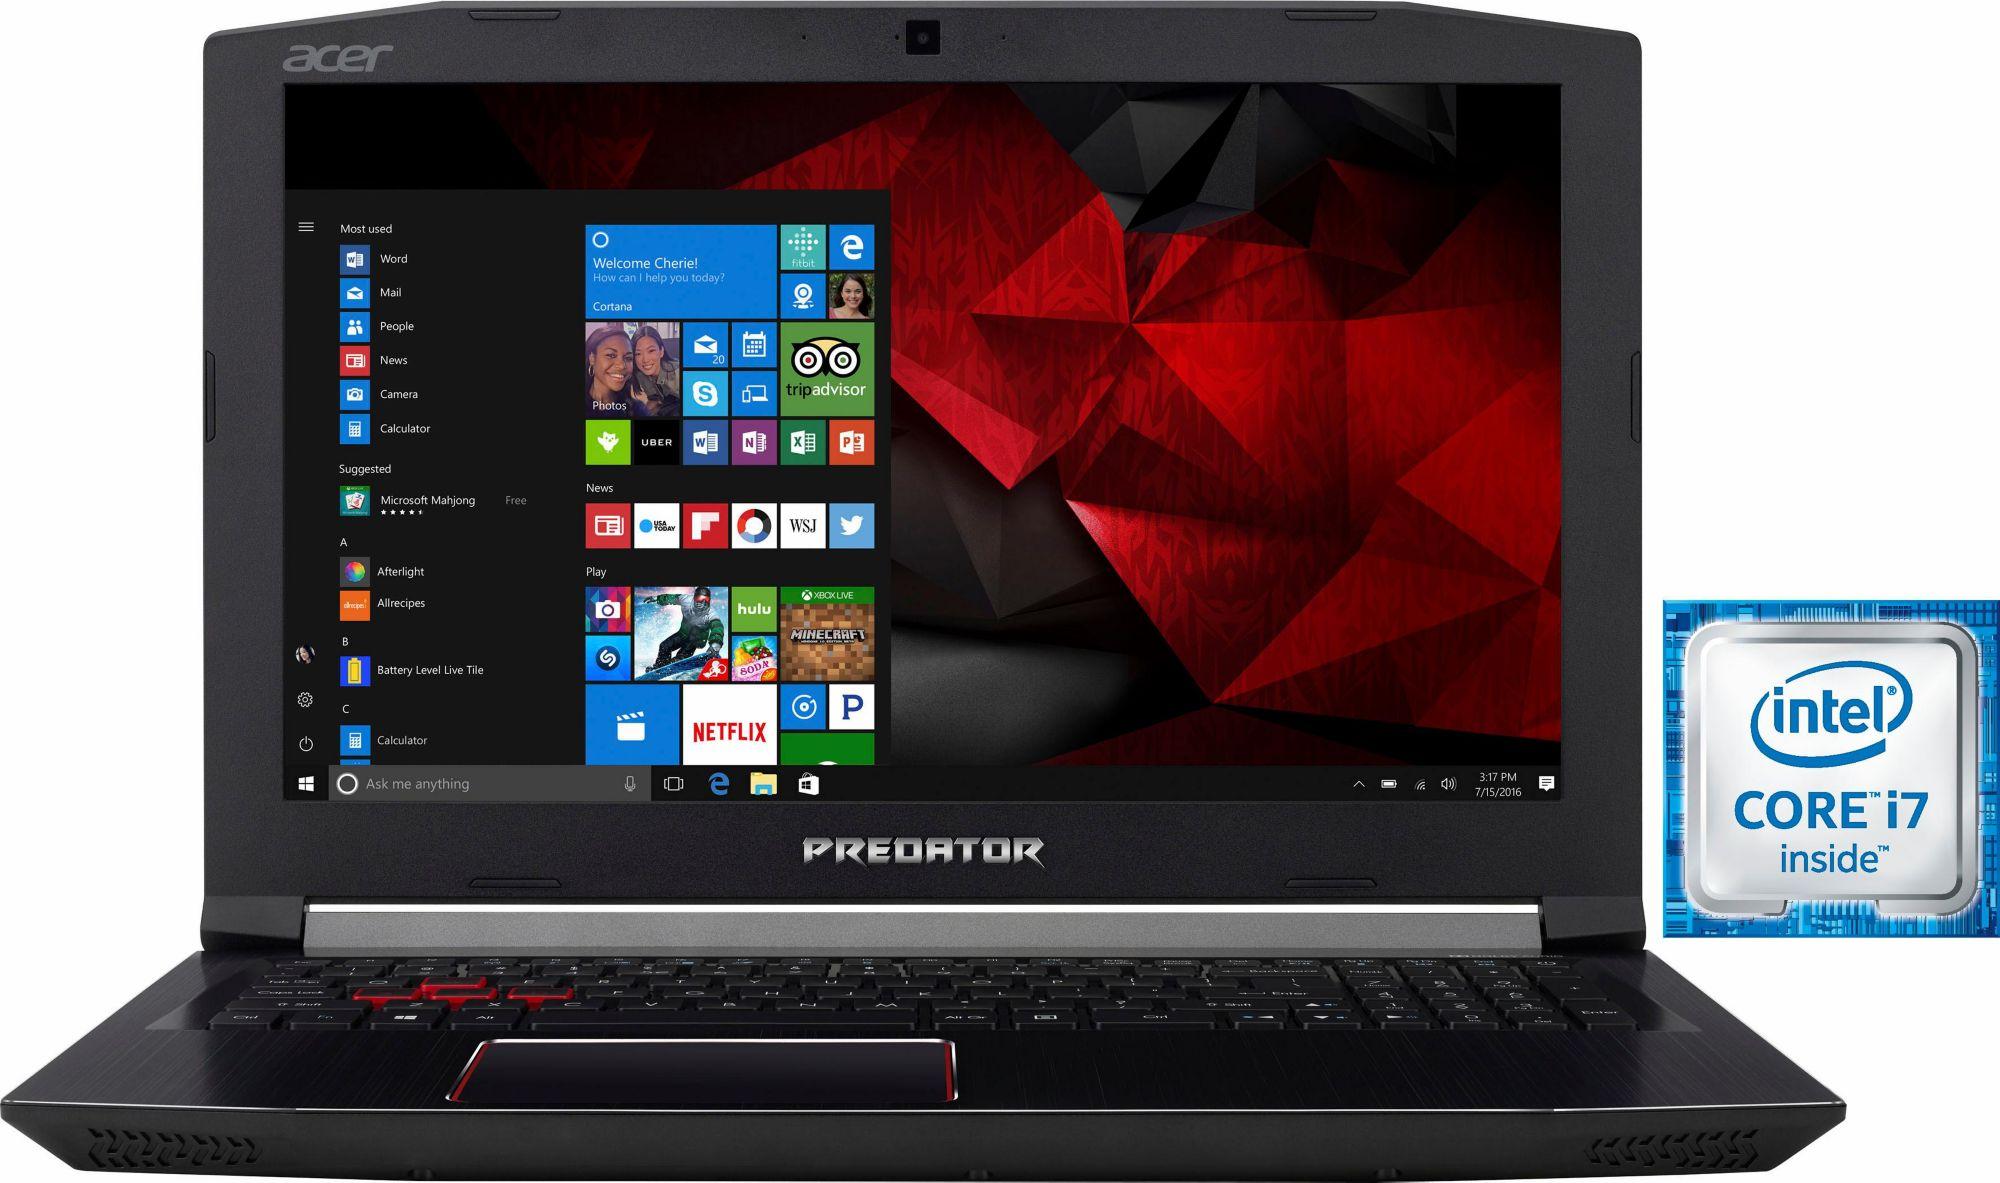 ACER Acer Predator PH317-51-78H7 Notebook, Intel® Core? i7, 43,9 cm (17,3 Zoll), 1256 GB Speicher